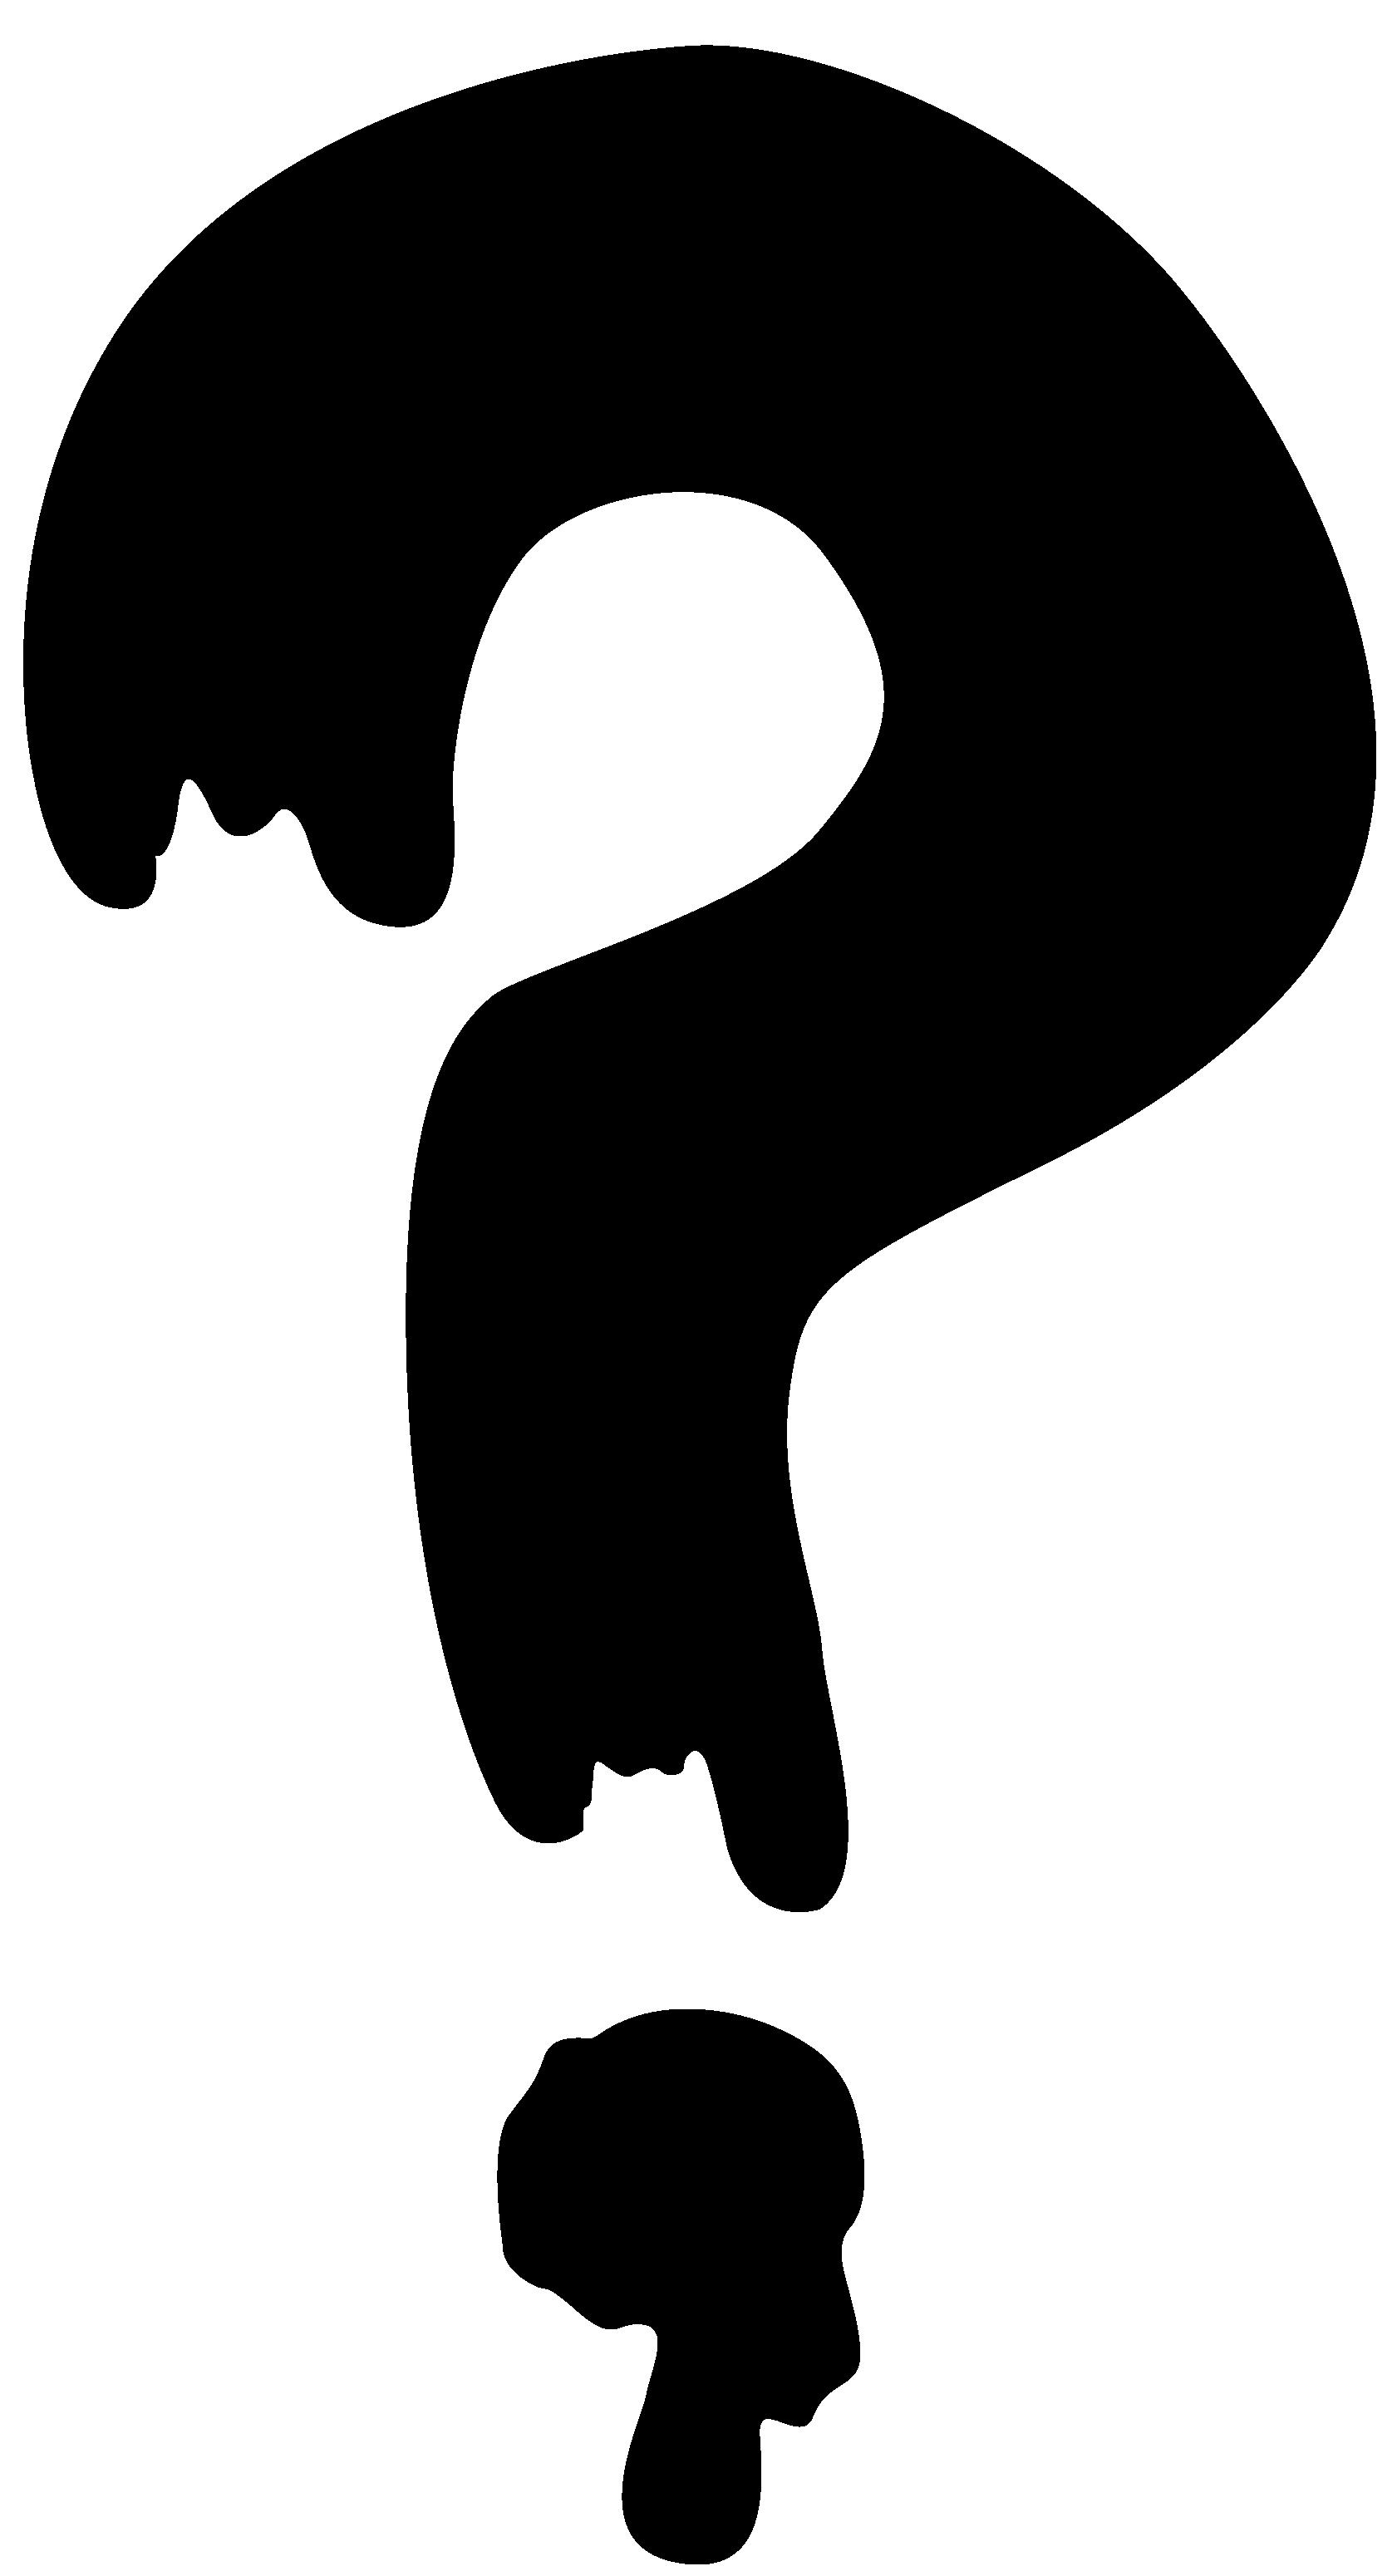 1675x3100 Img Draggable=false Class=emoji